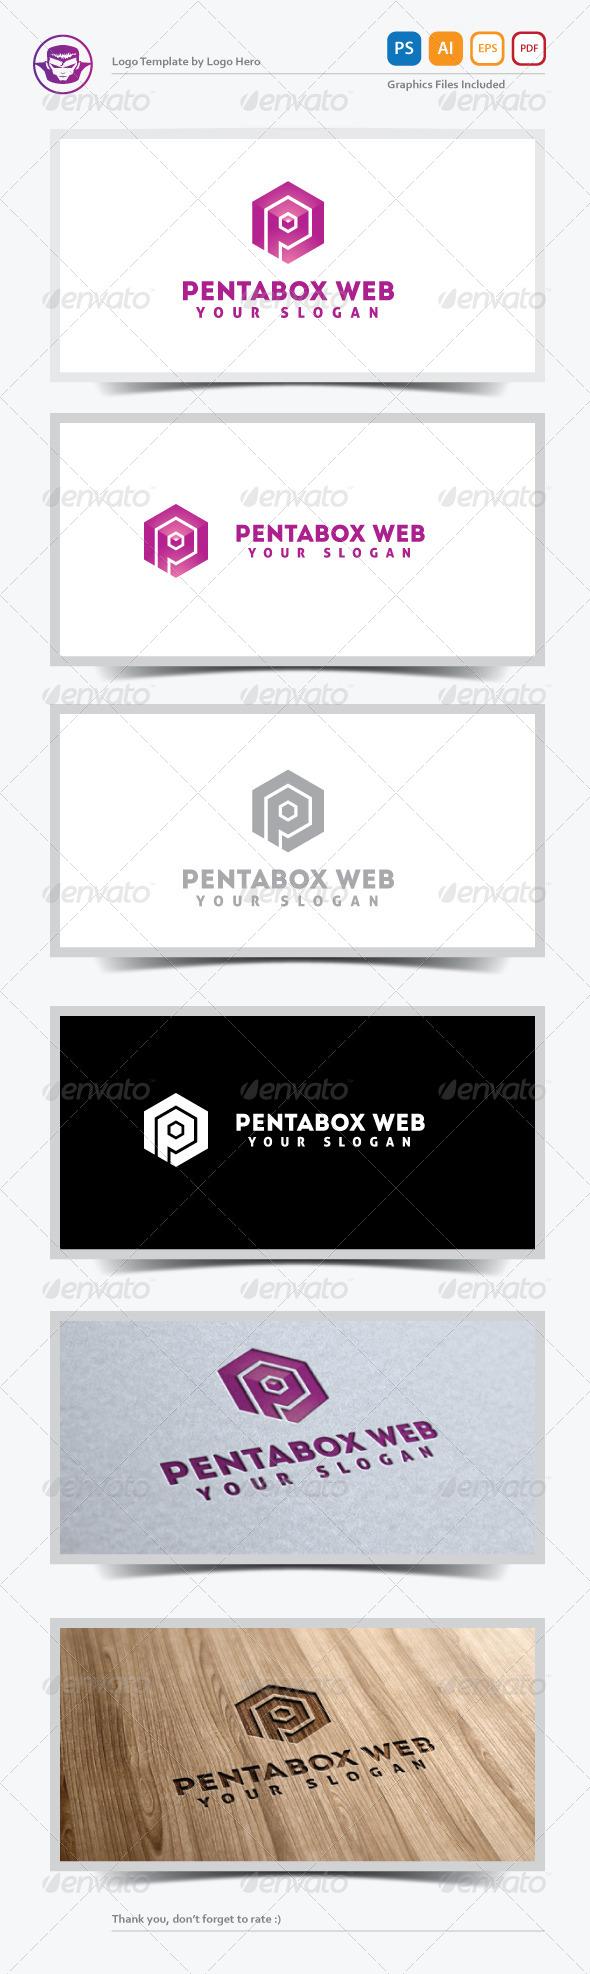 GraphicRiver Pentabox Web Logo Template 5284249